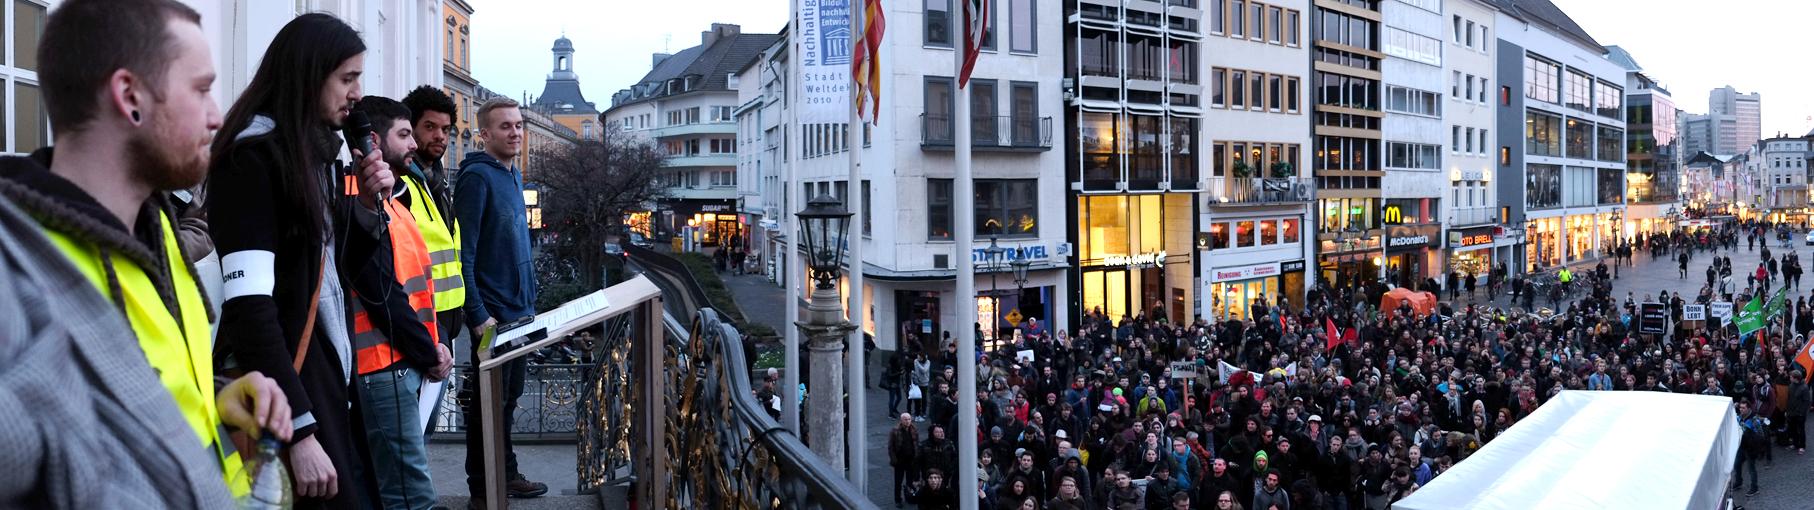 JoHempel_201402_Demo_Kulturraum_Bonn_DSCF1316